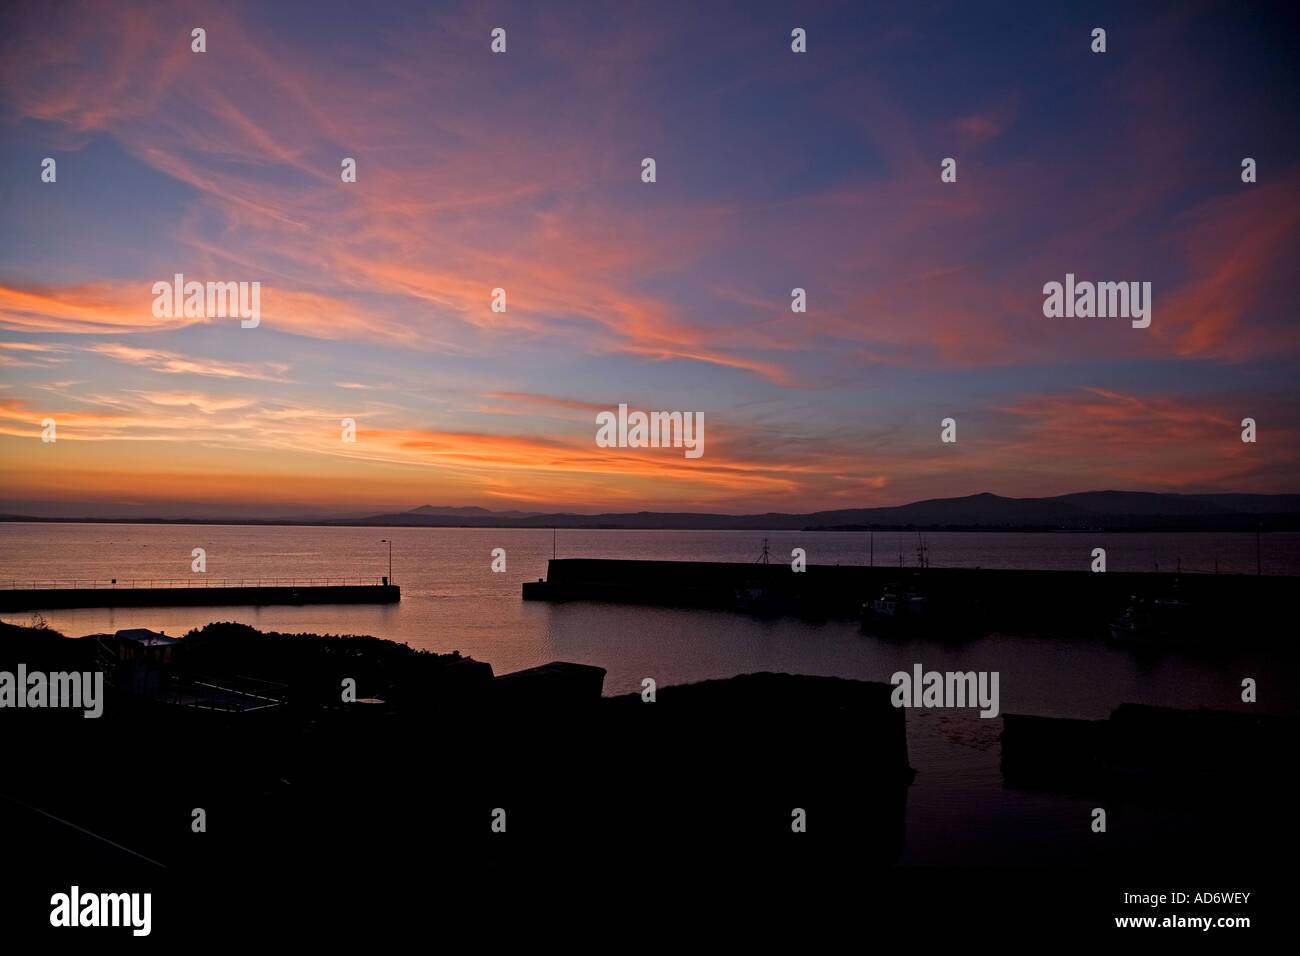 Helvick Fishing Harbour, Ring, Gaeltacht (Gaelic Speaking Area), County Waterford, Ireland - Stock Image